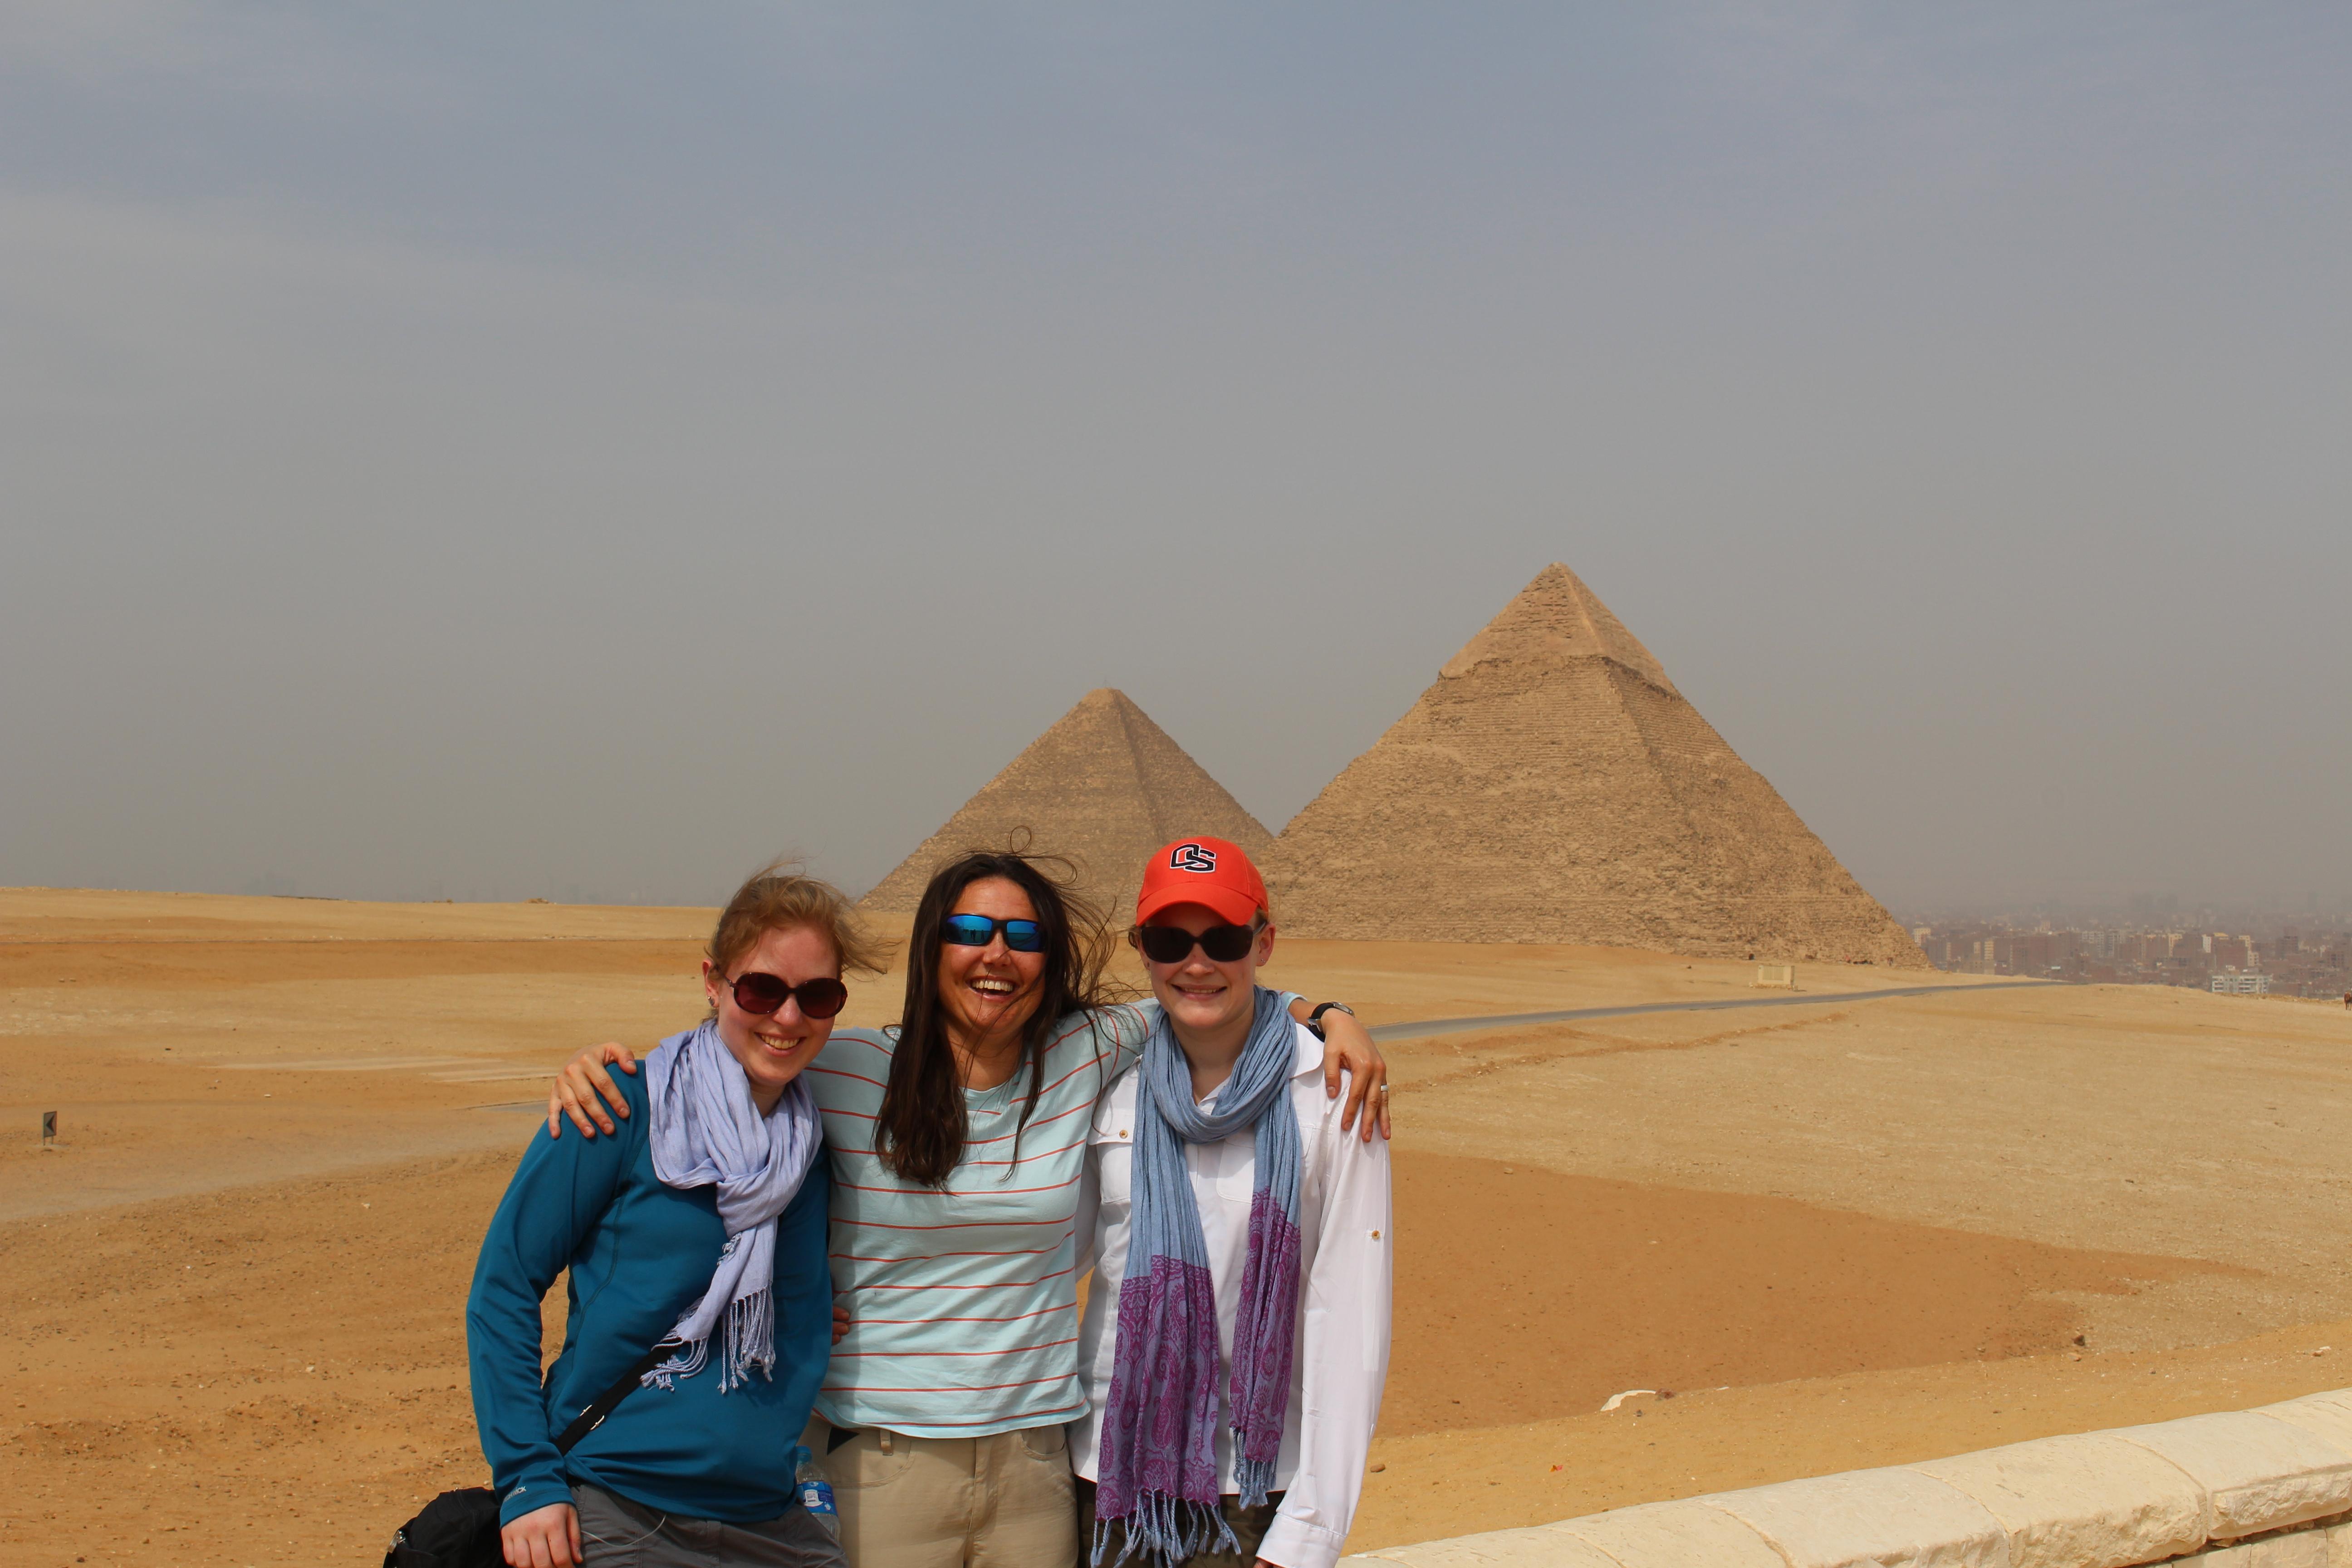 Peyton lab at the Pyramids 2015